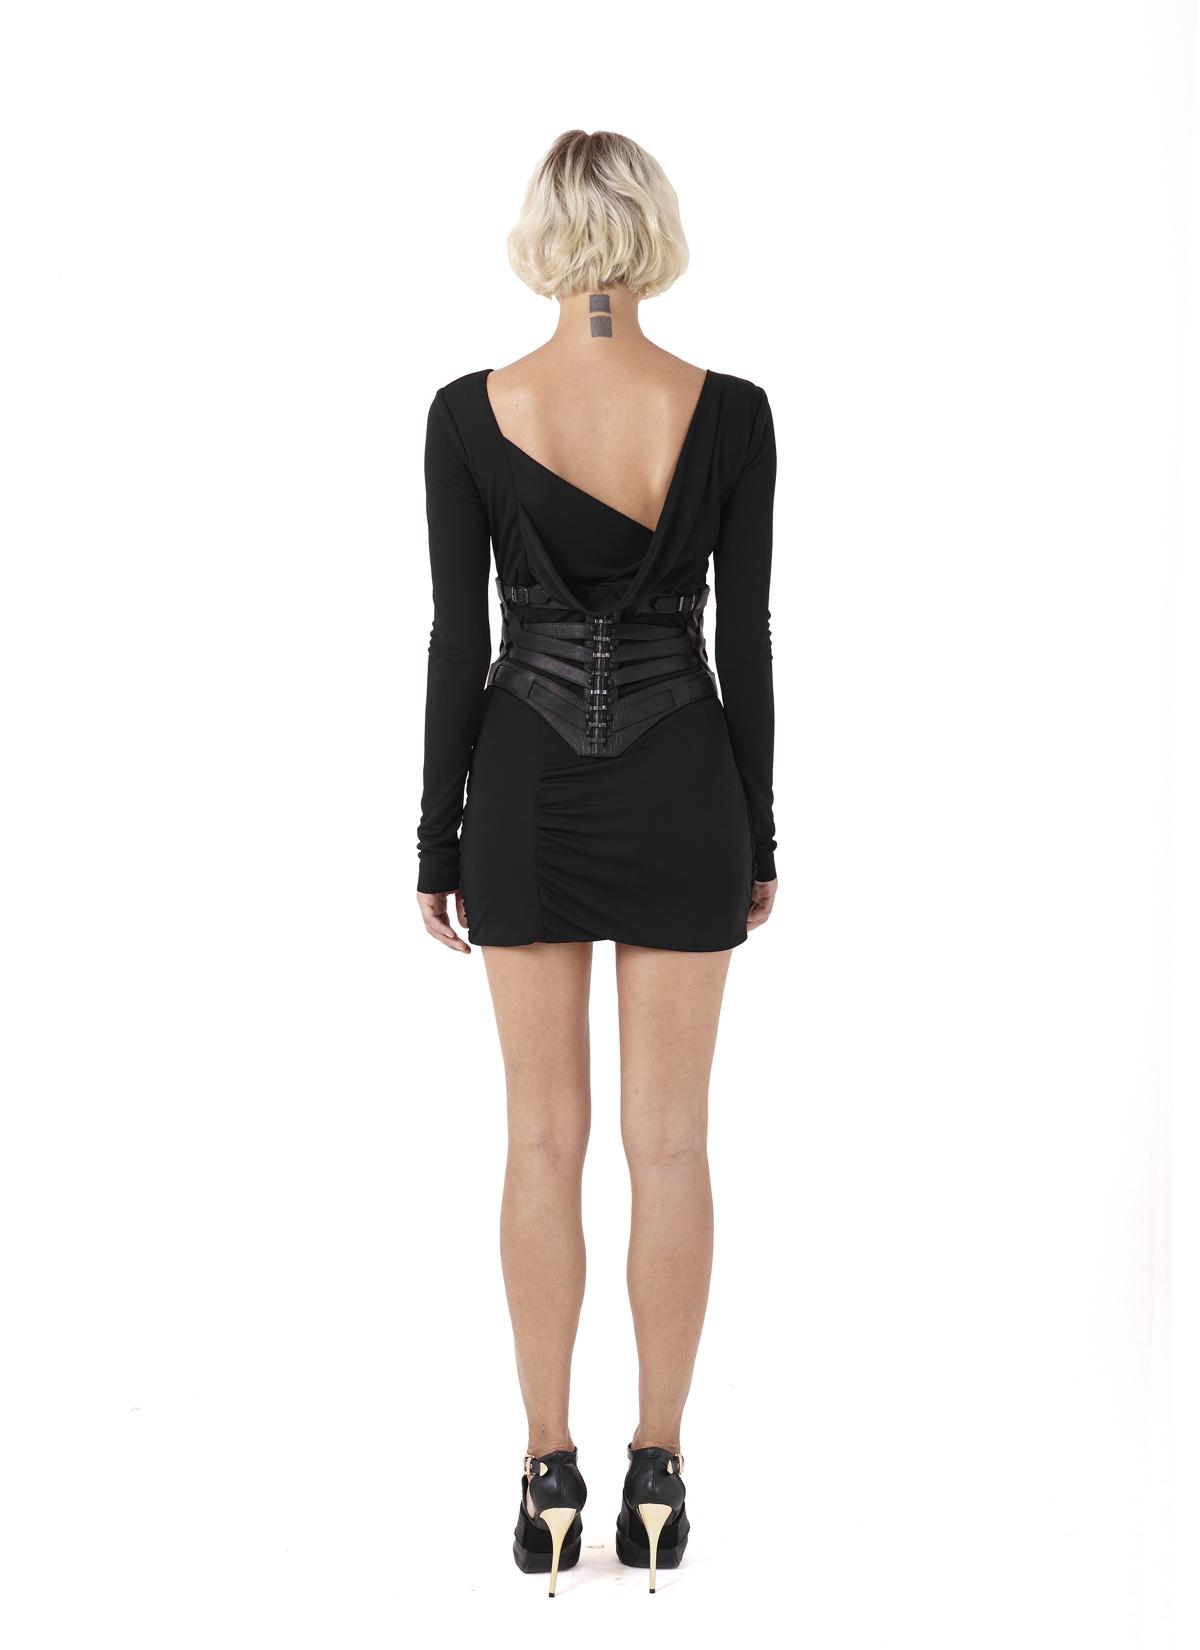 Quartz corset & Scoria dress